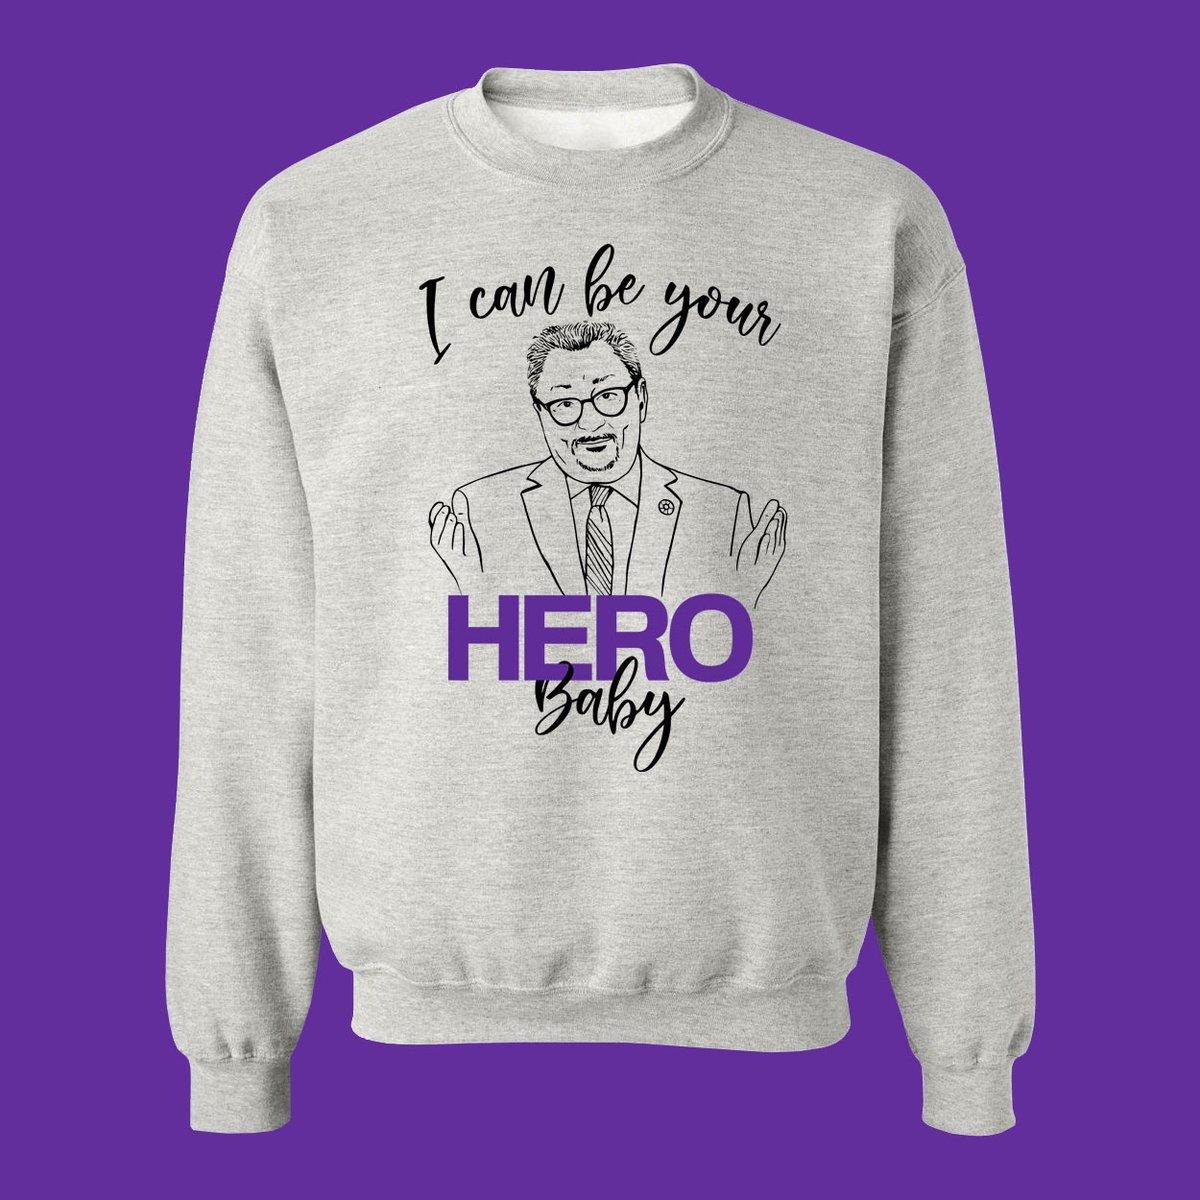 Cliquez ici pour acheter Chandail Horacio Arruda – I can be your Hero baby